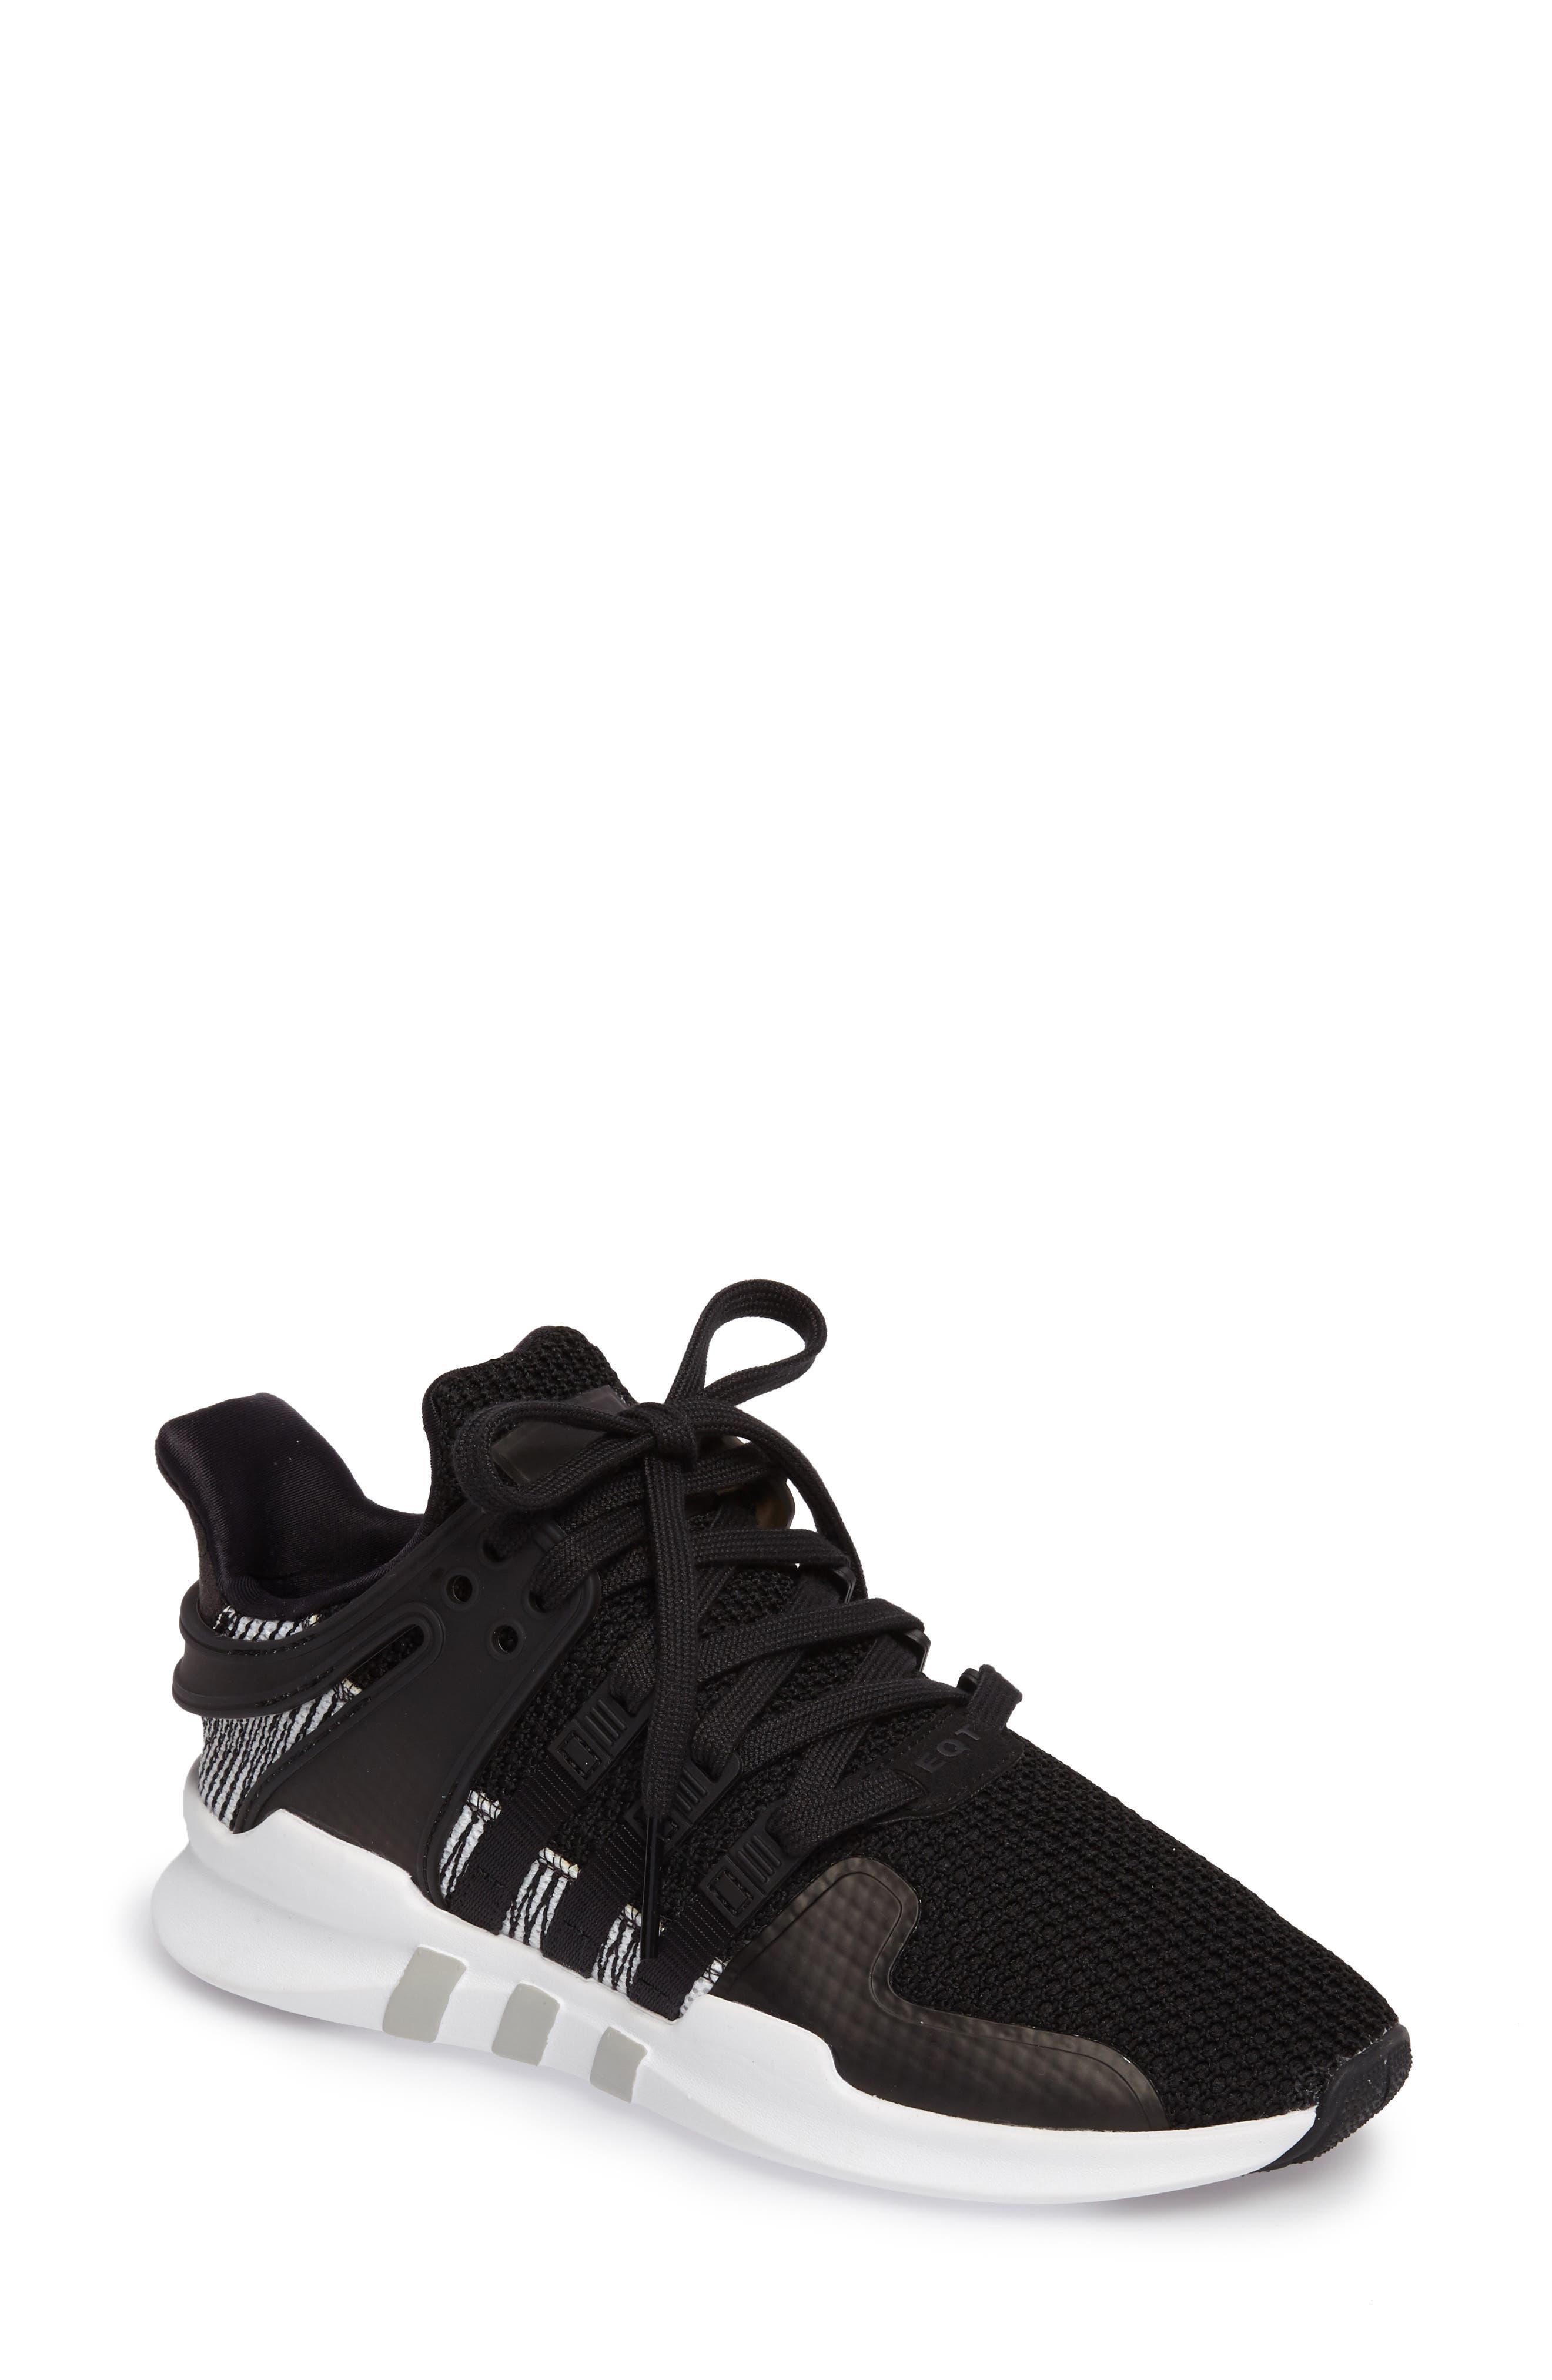 adidas EQT Support Adv Sneaker (Women)